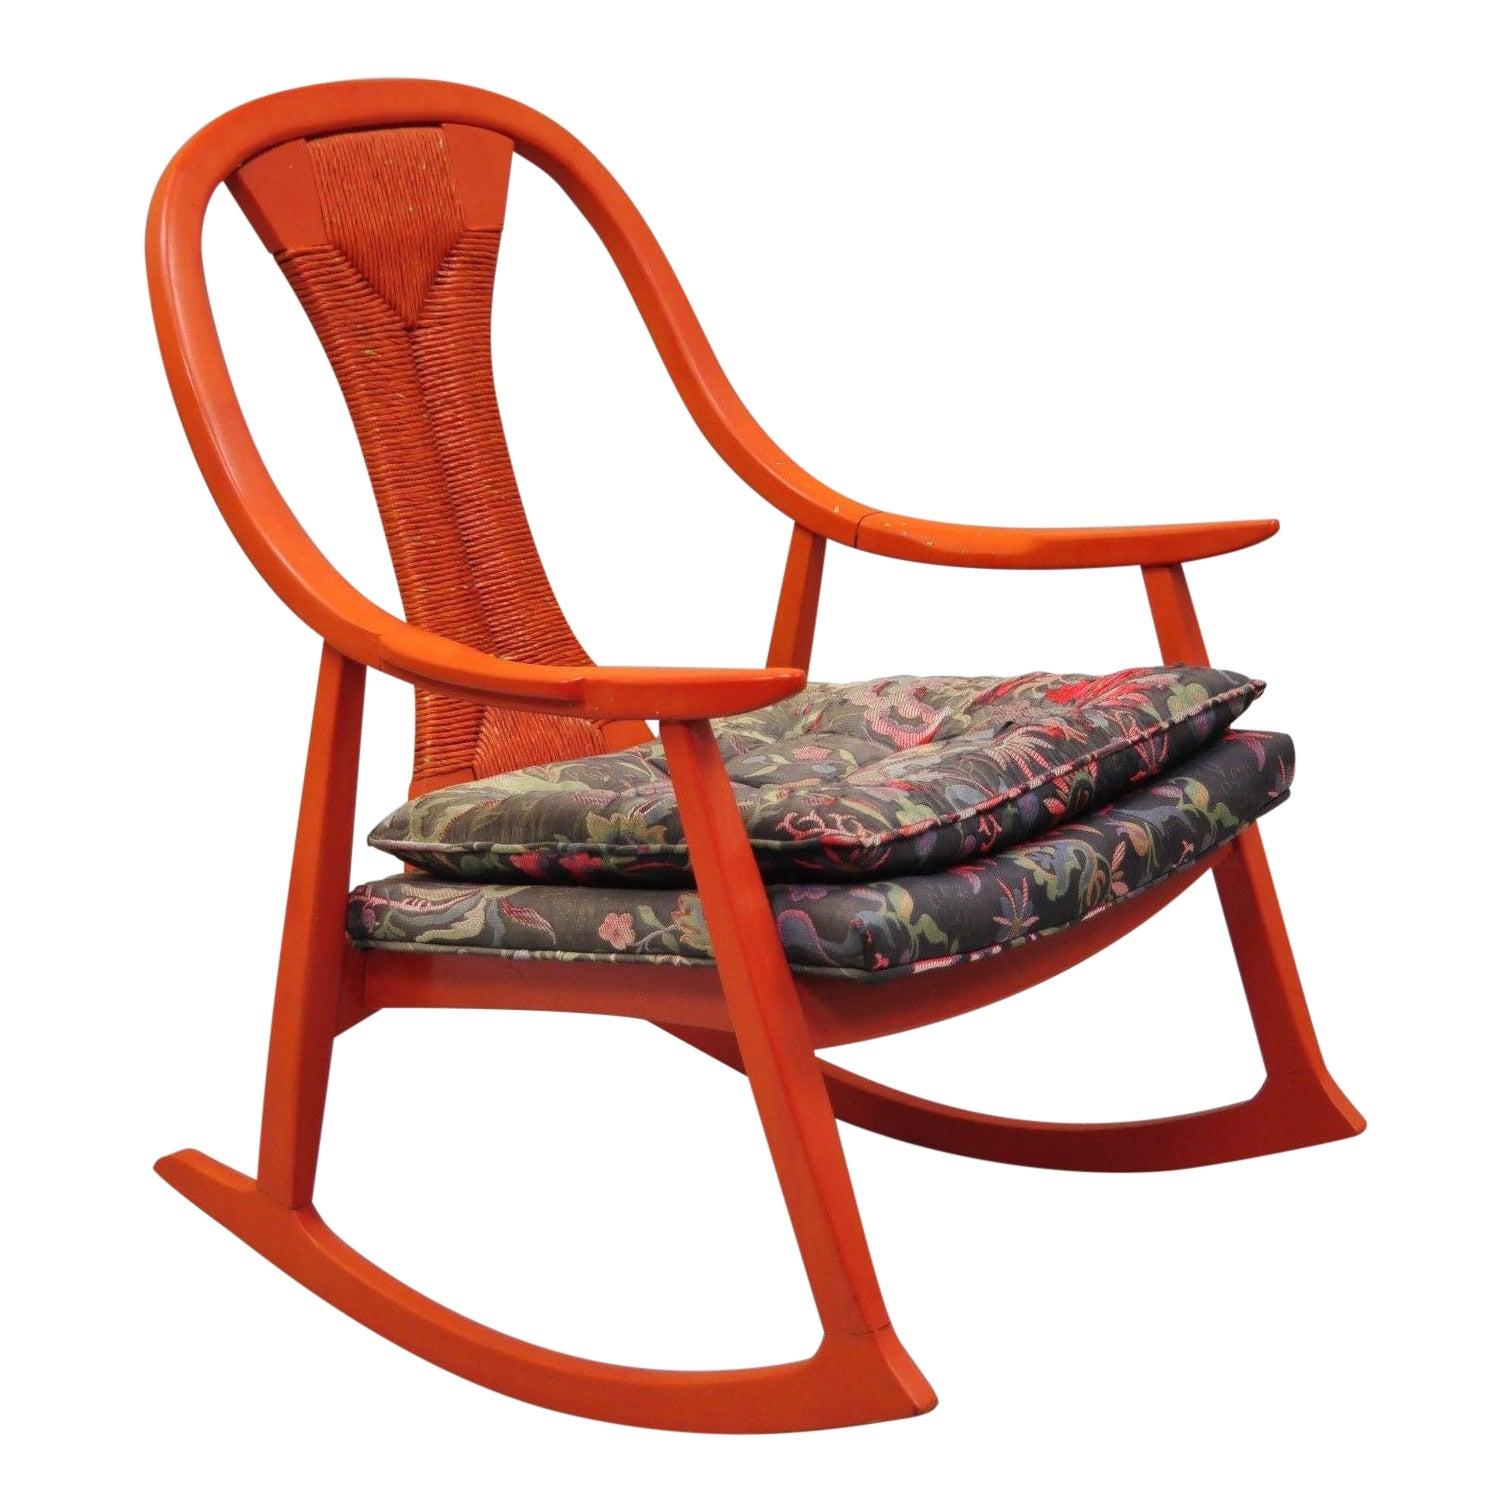 20th Century Danish Modern Red Wood Rattan Wicker Rocking Chair